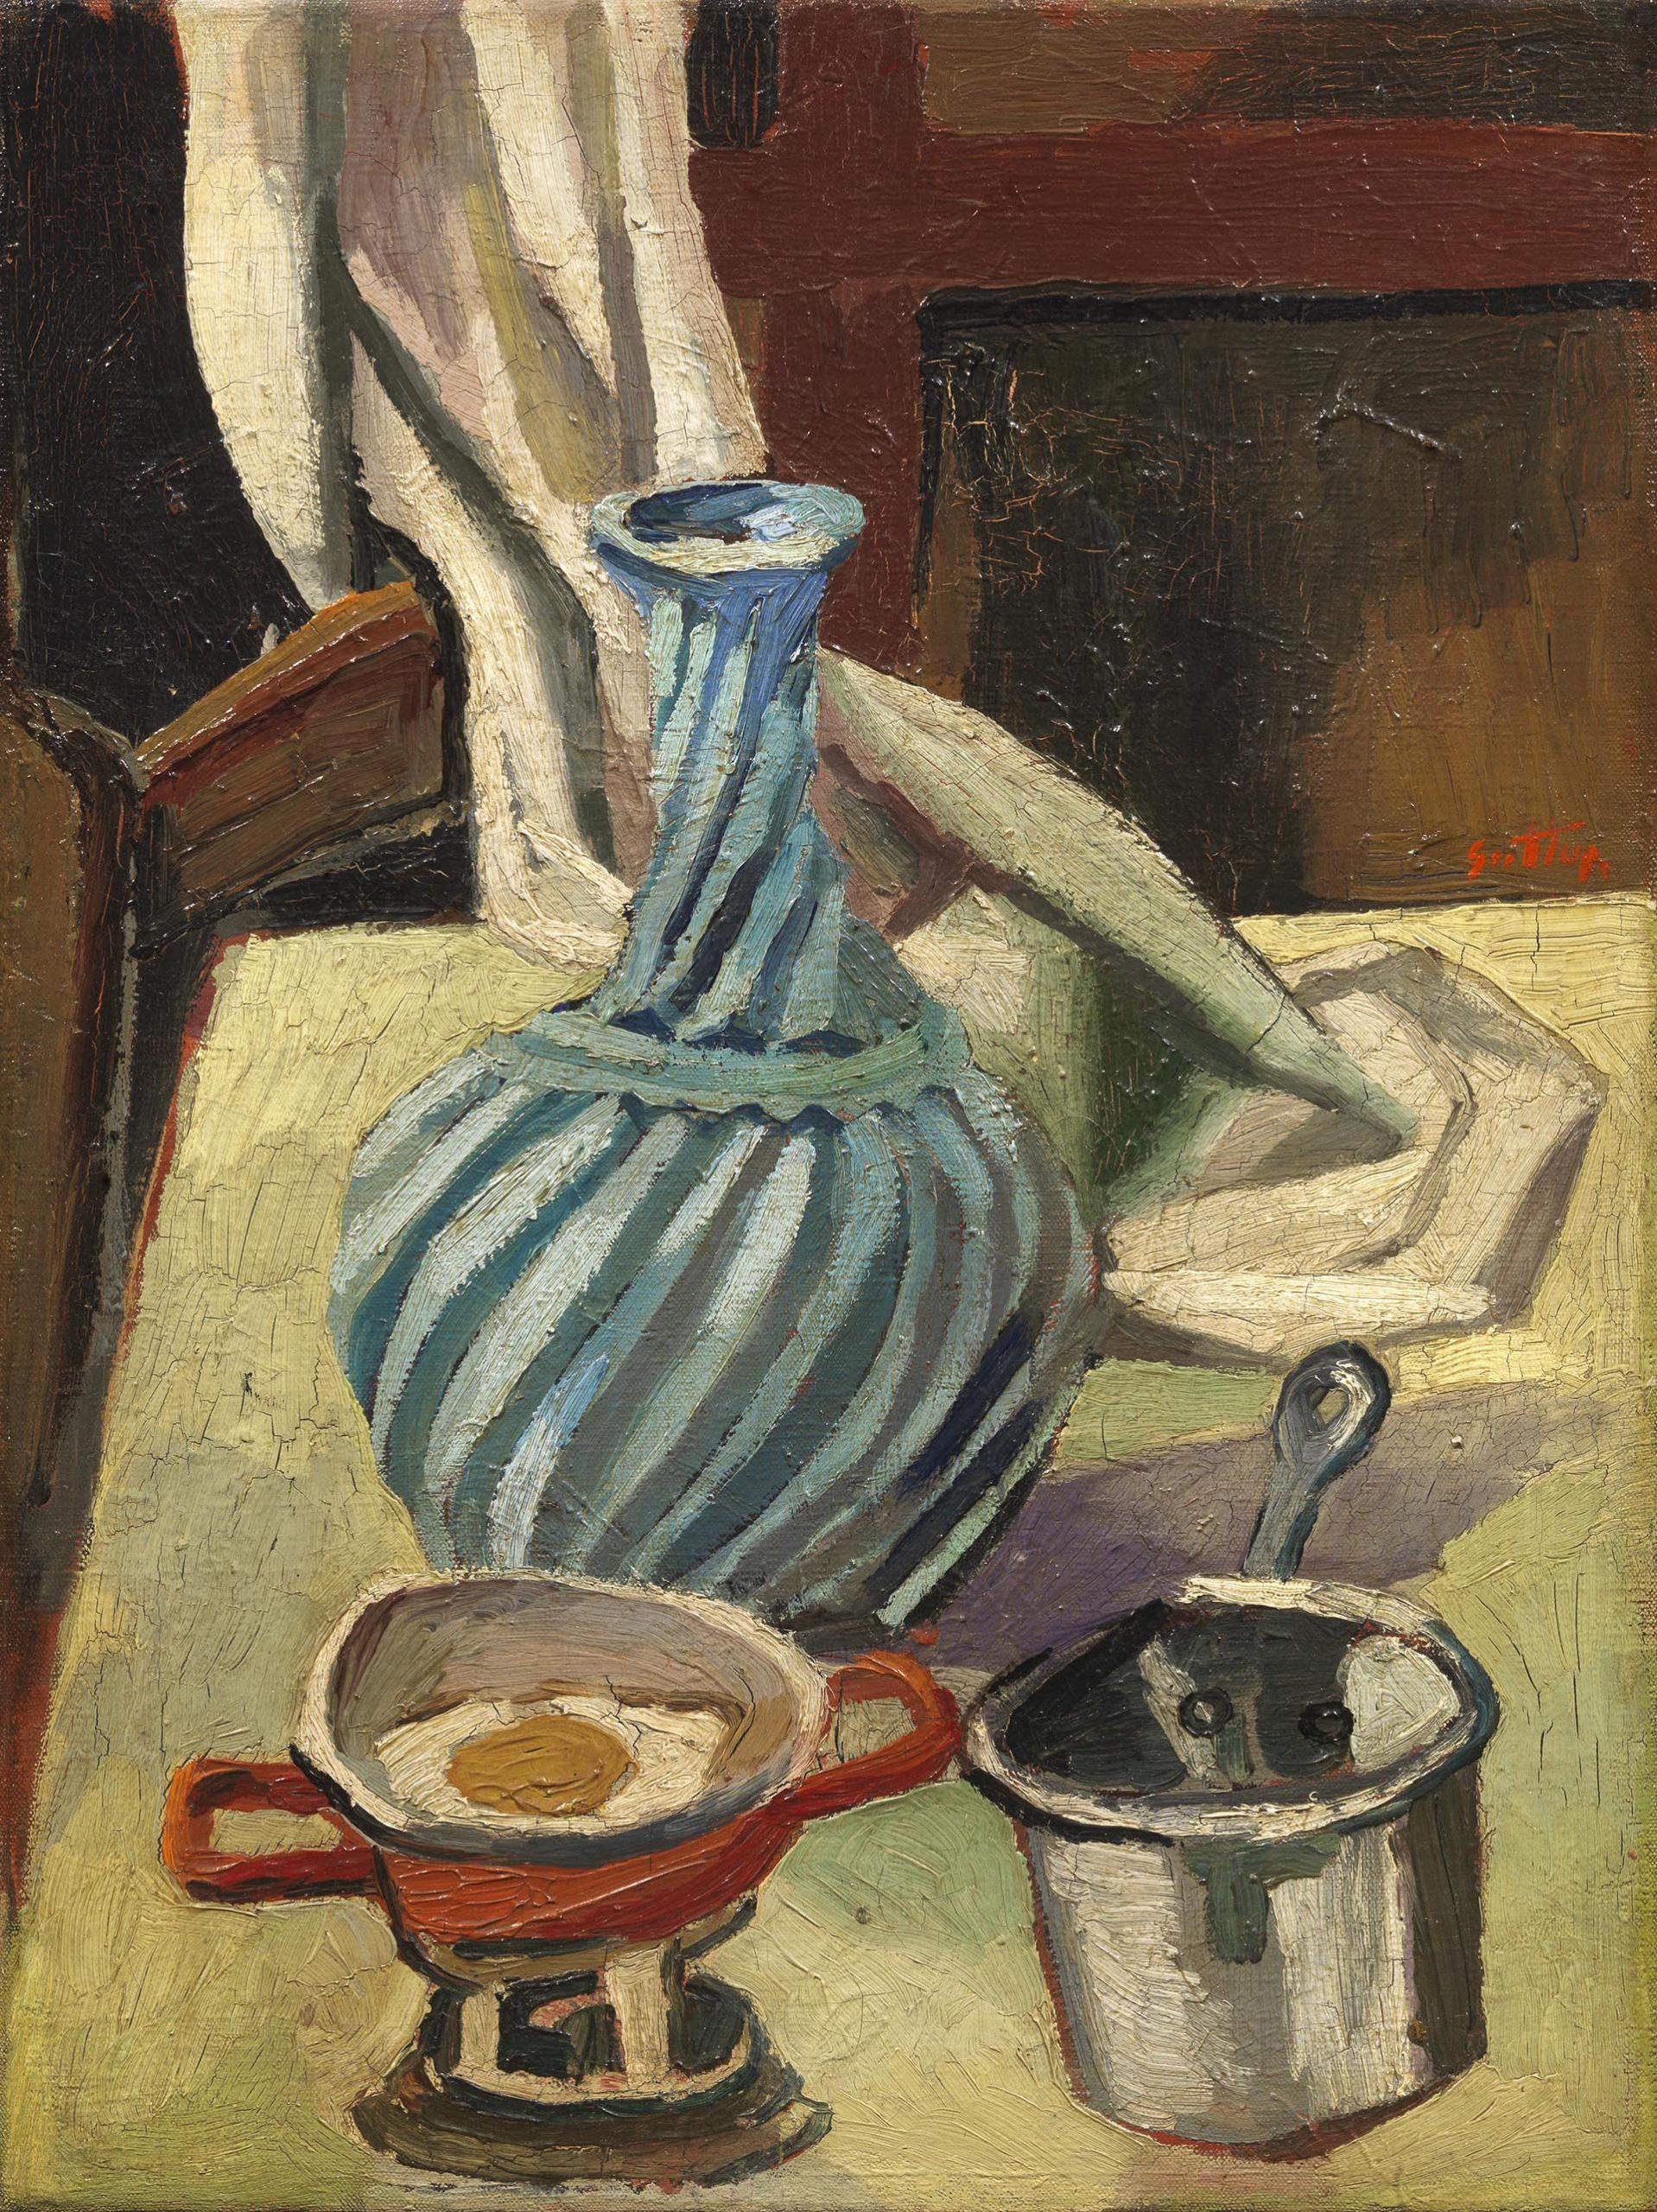 Guttuso, Natura morta, 1940-41, 55x40 cm